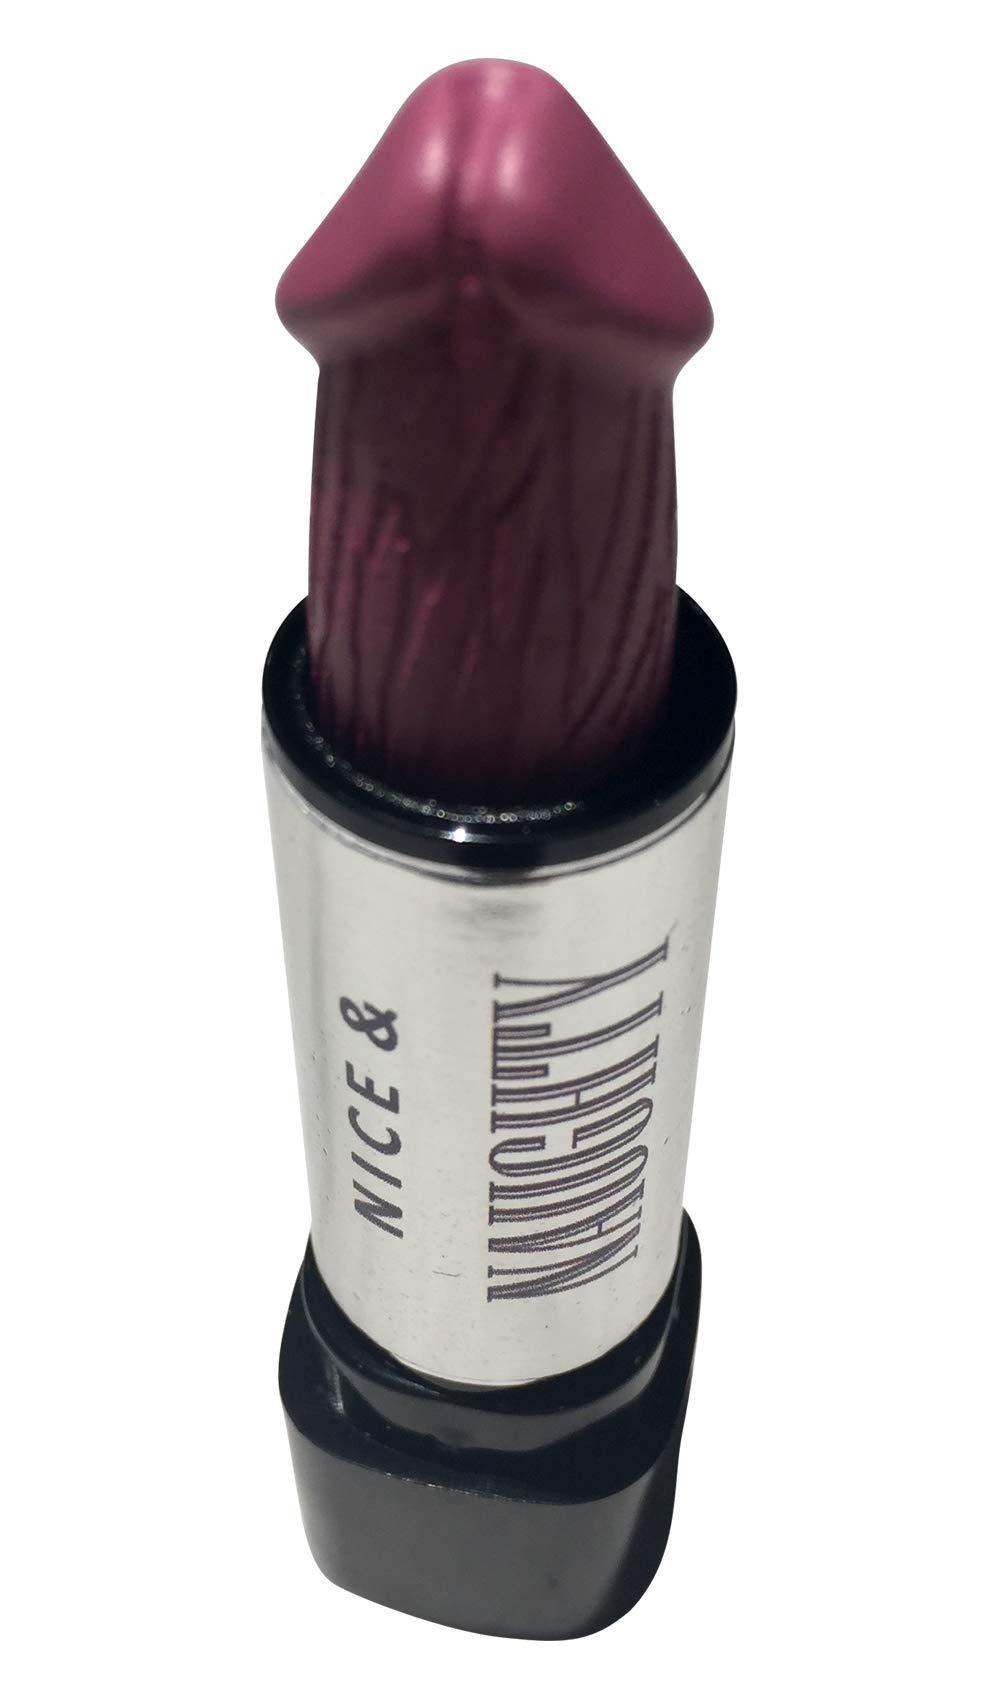 Amazoncom Happy Dickember Lipstick Secret Santa Gifts Funny Gag